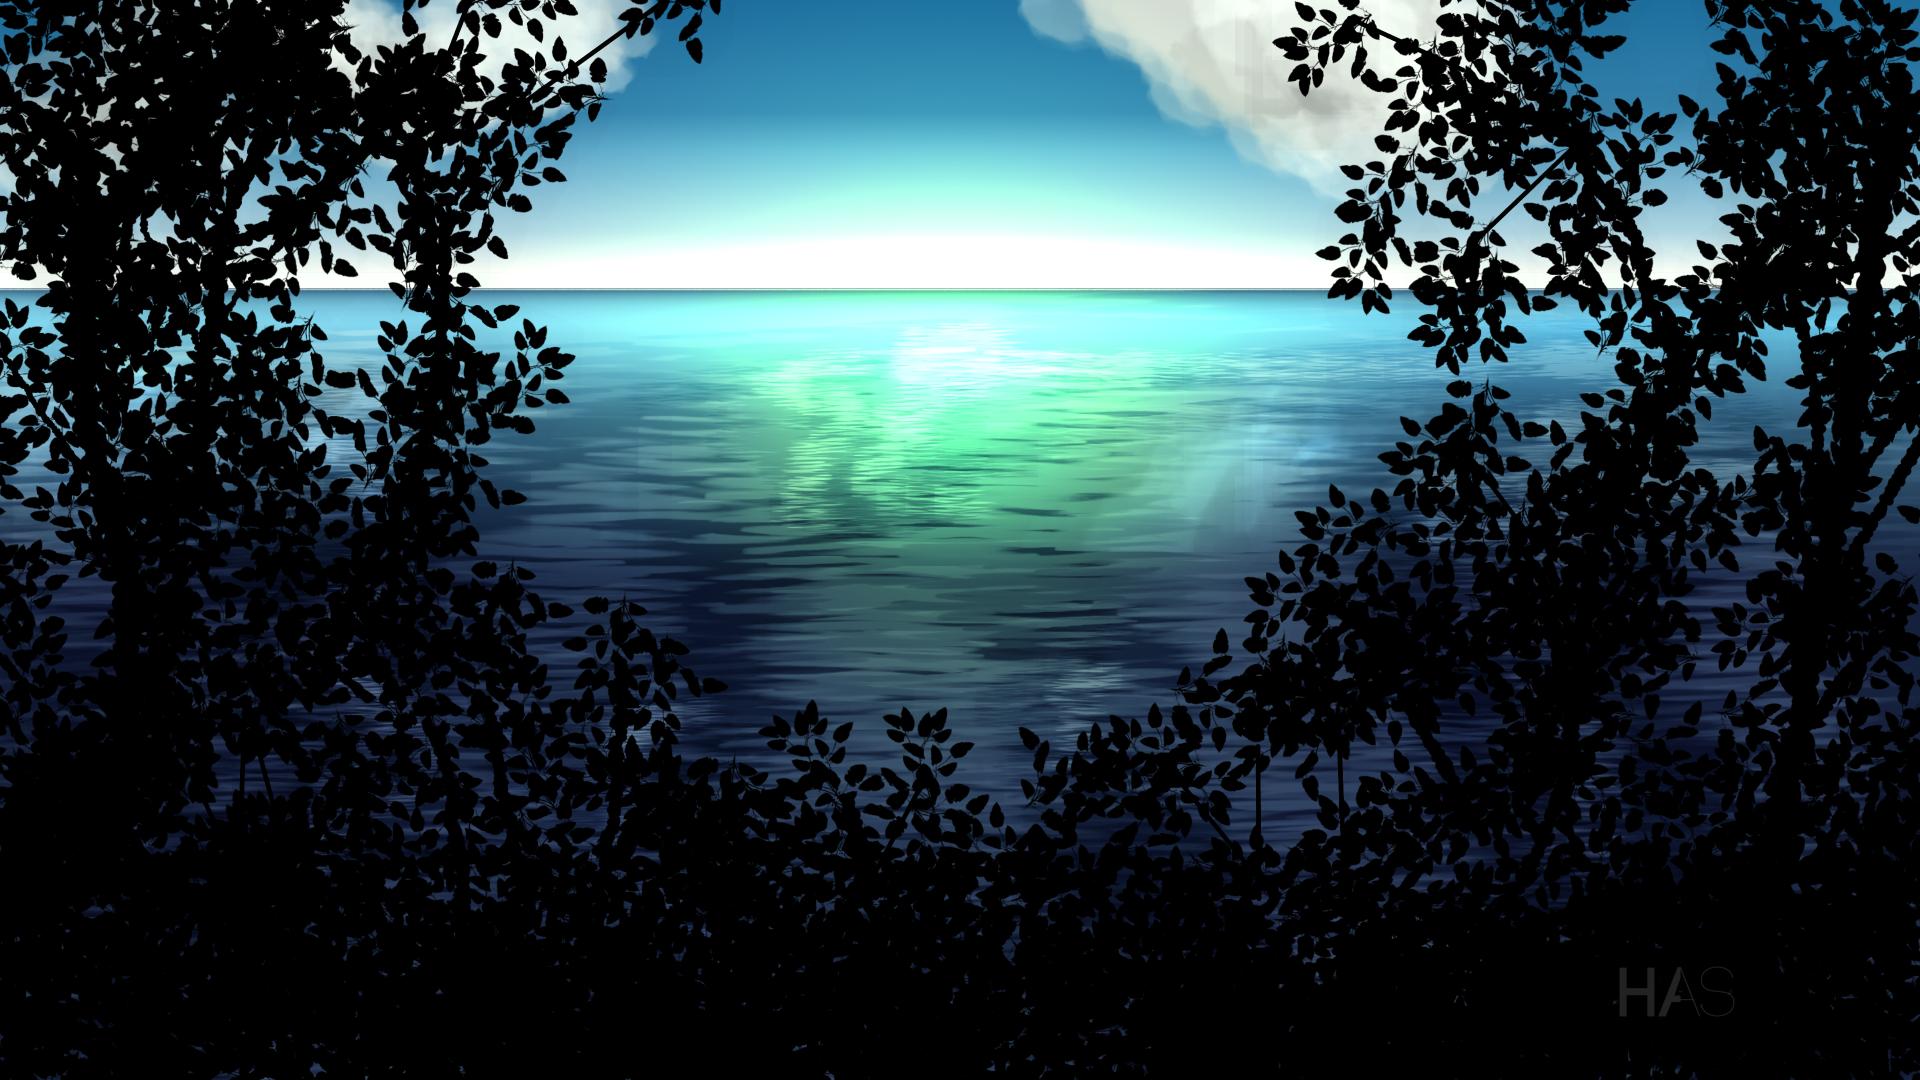 Artistic - Ocean  Sea Blue Scenic Dark Wallpaper